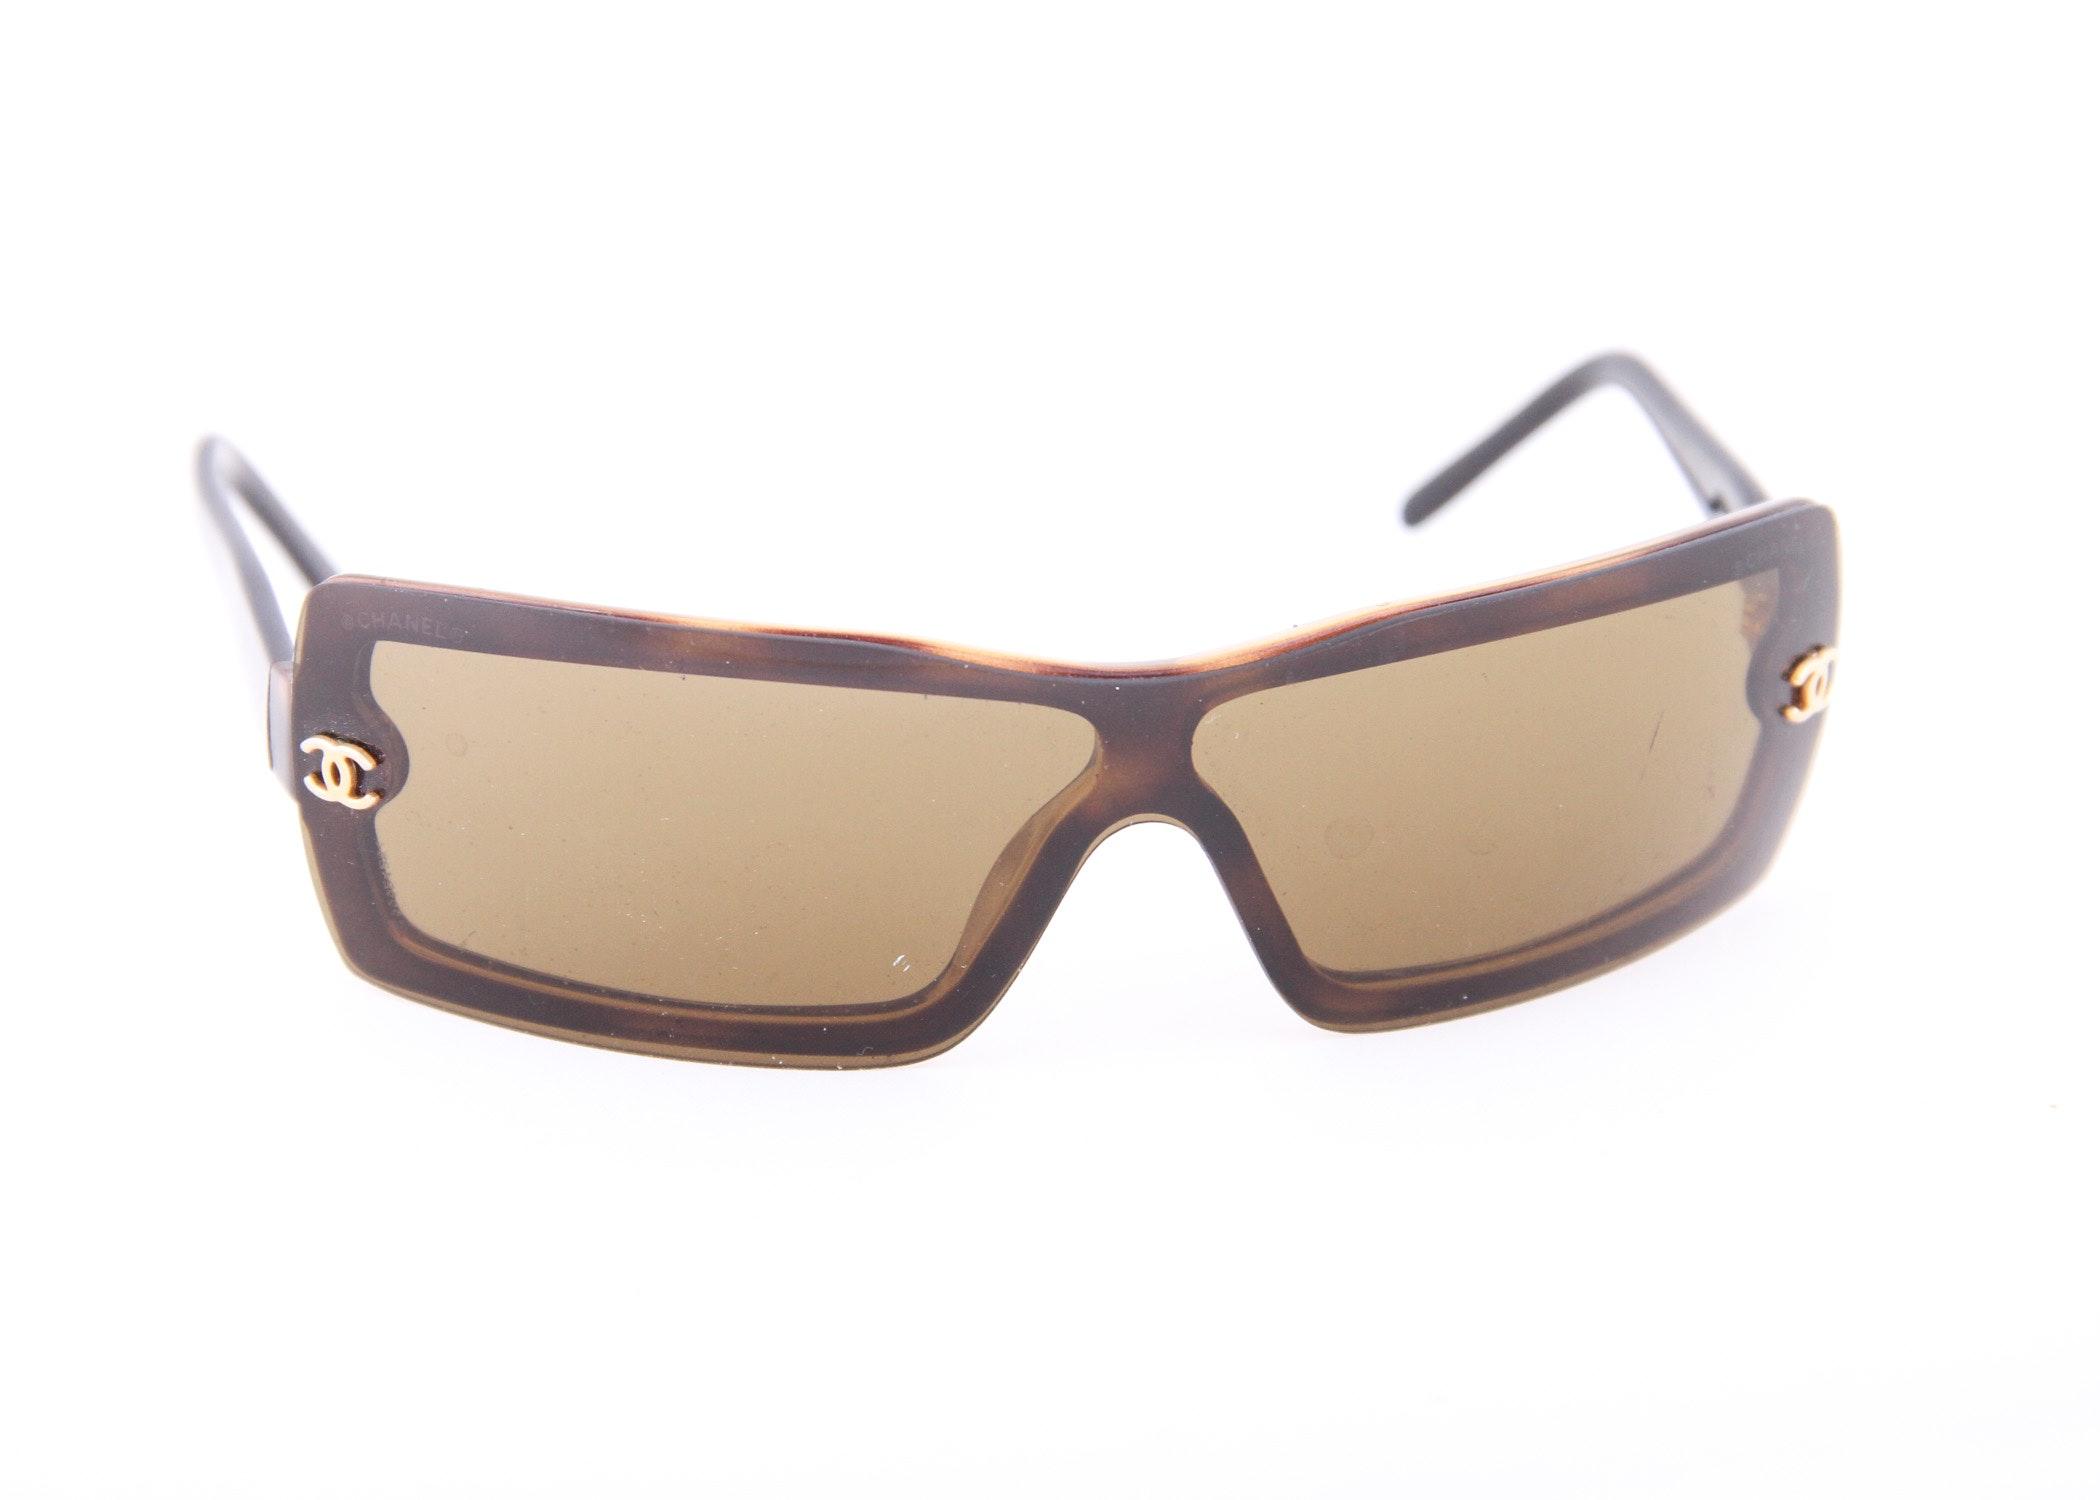 Pair of Chanel Sunglasses